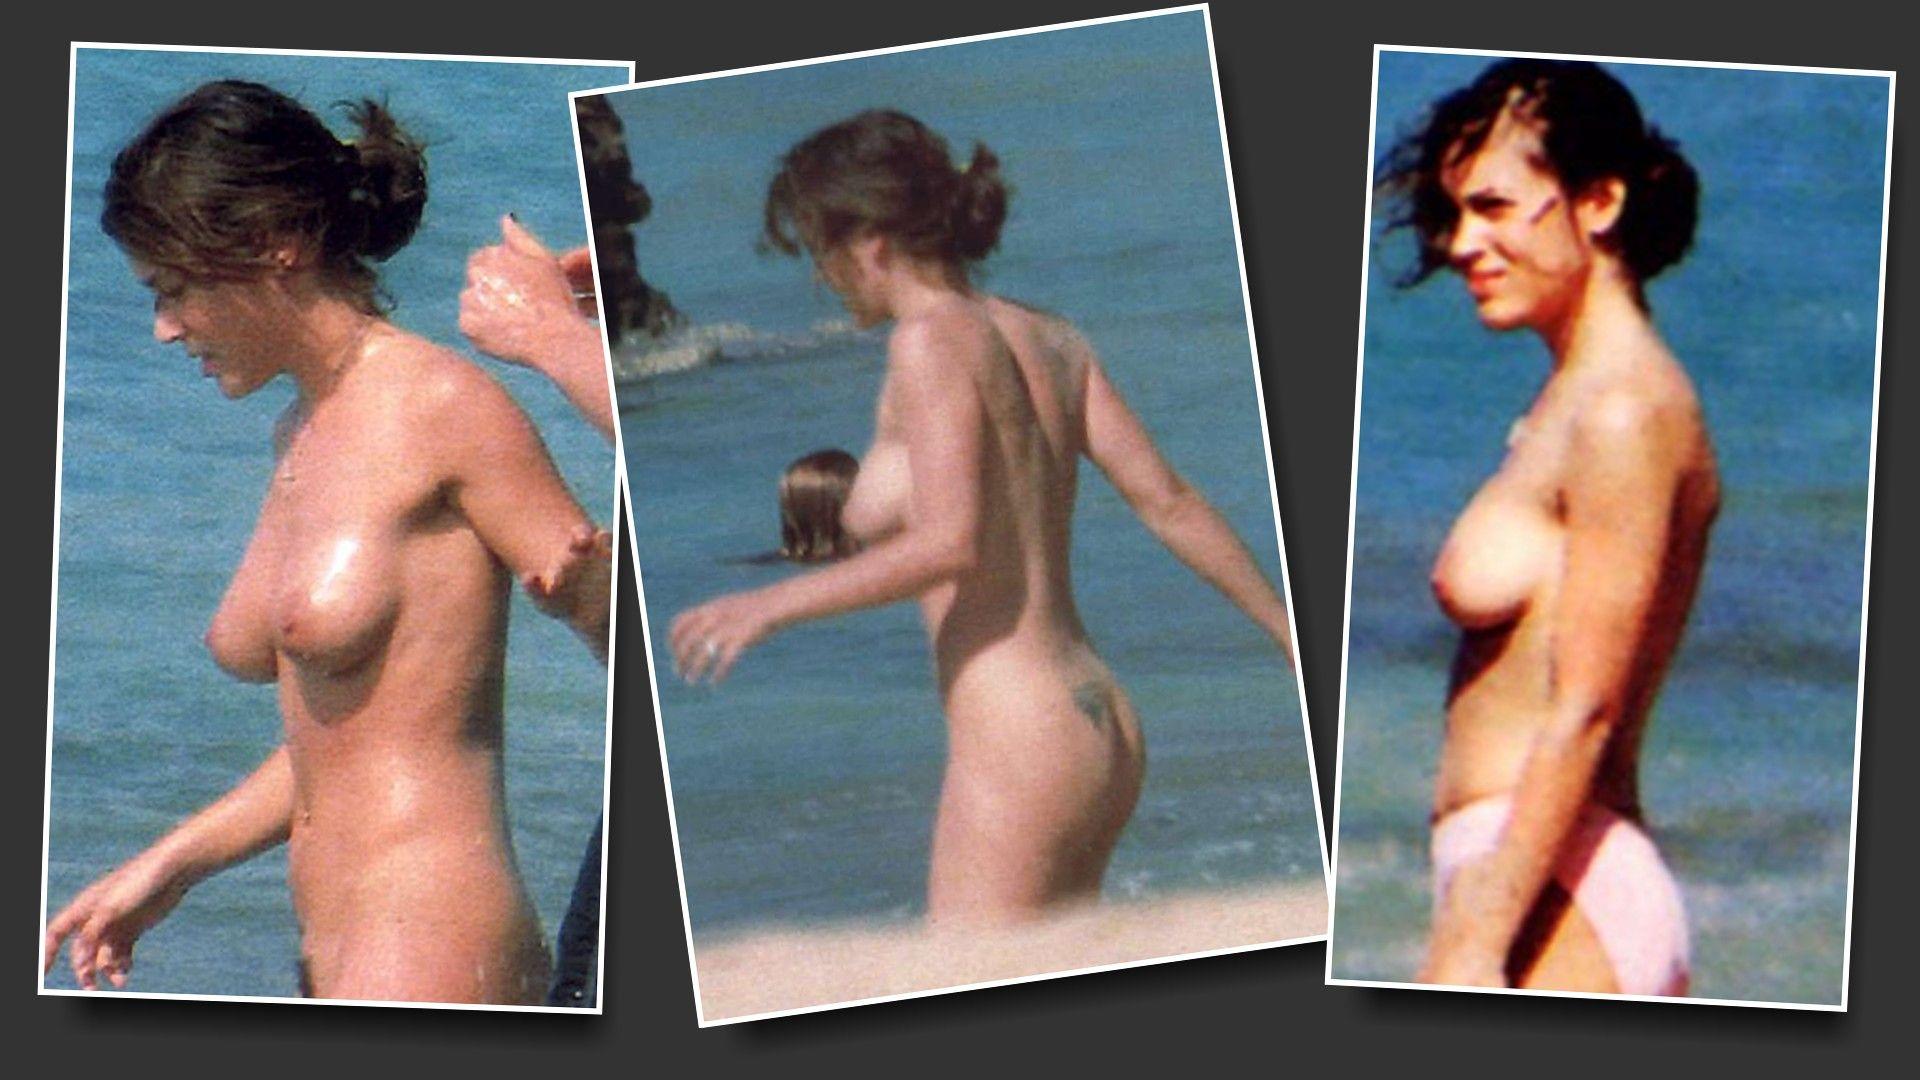 Alyssa Milano Nude Video pinart of dan demille on my favorites! | alyssa milano